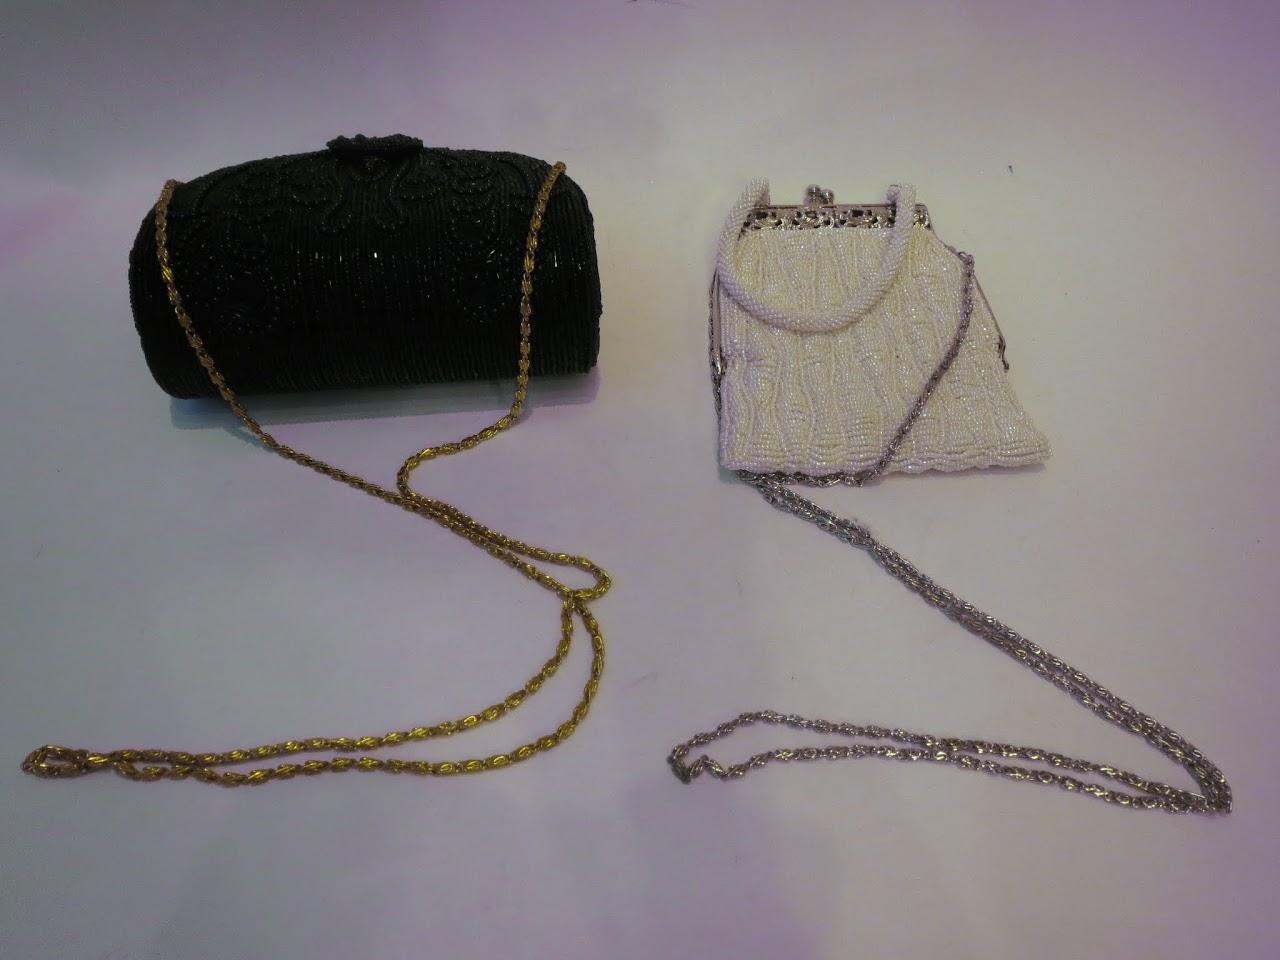 Vintage Beaded Evening Bag Pair